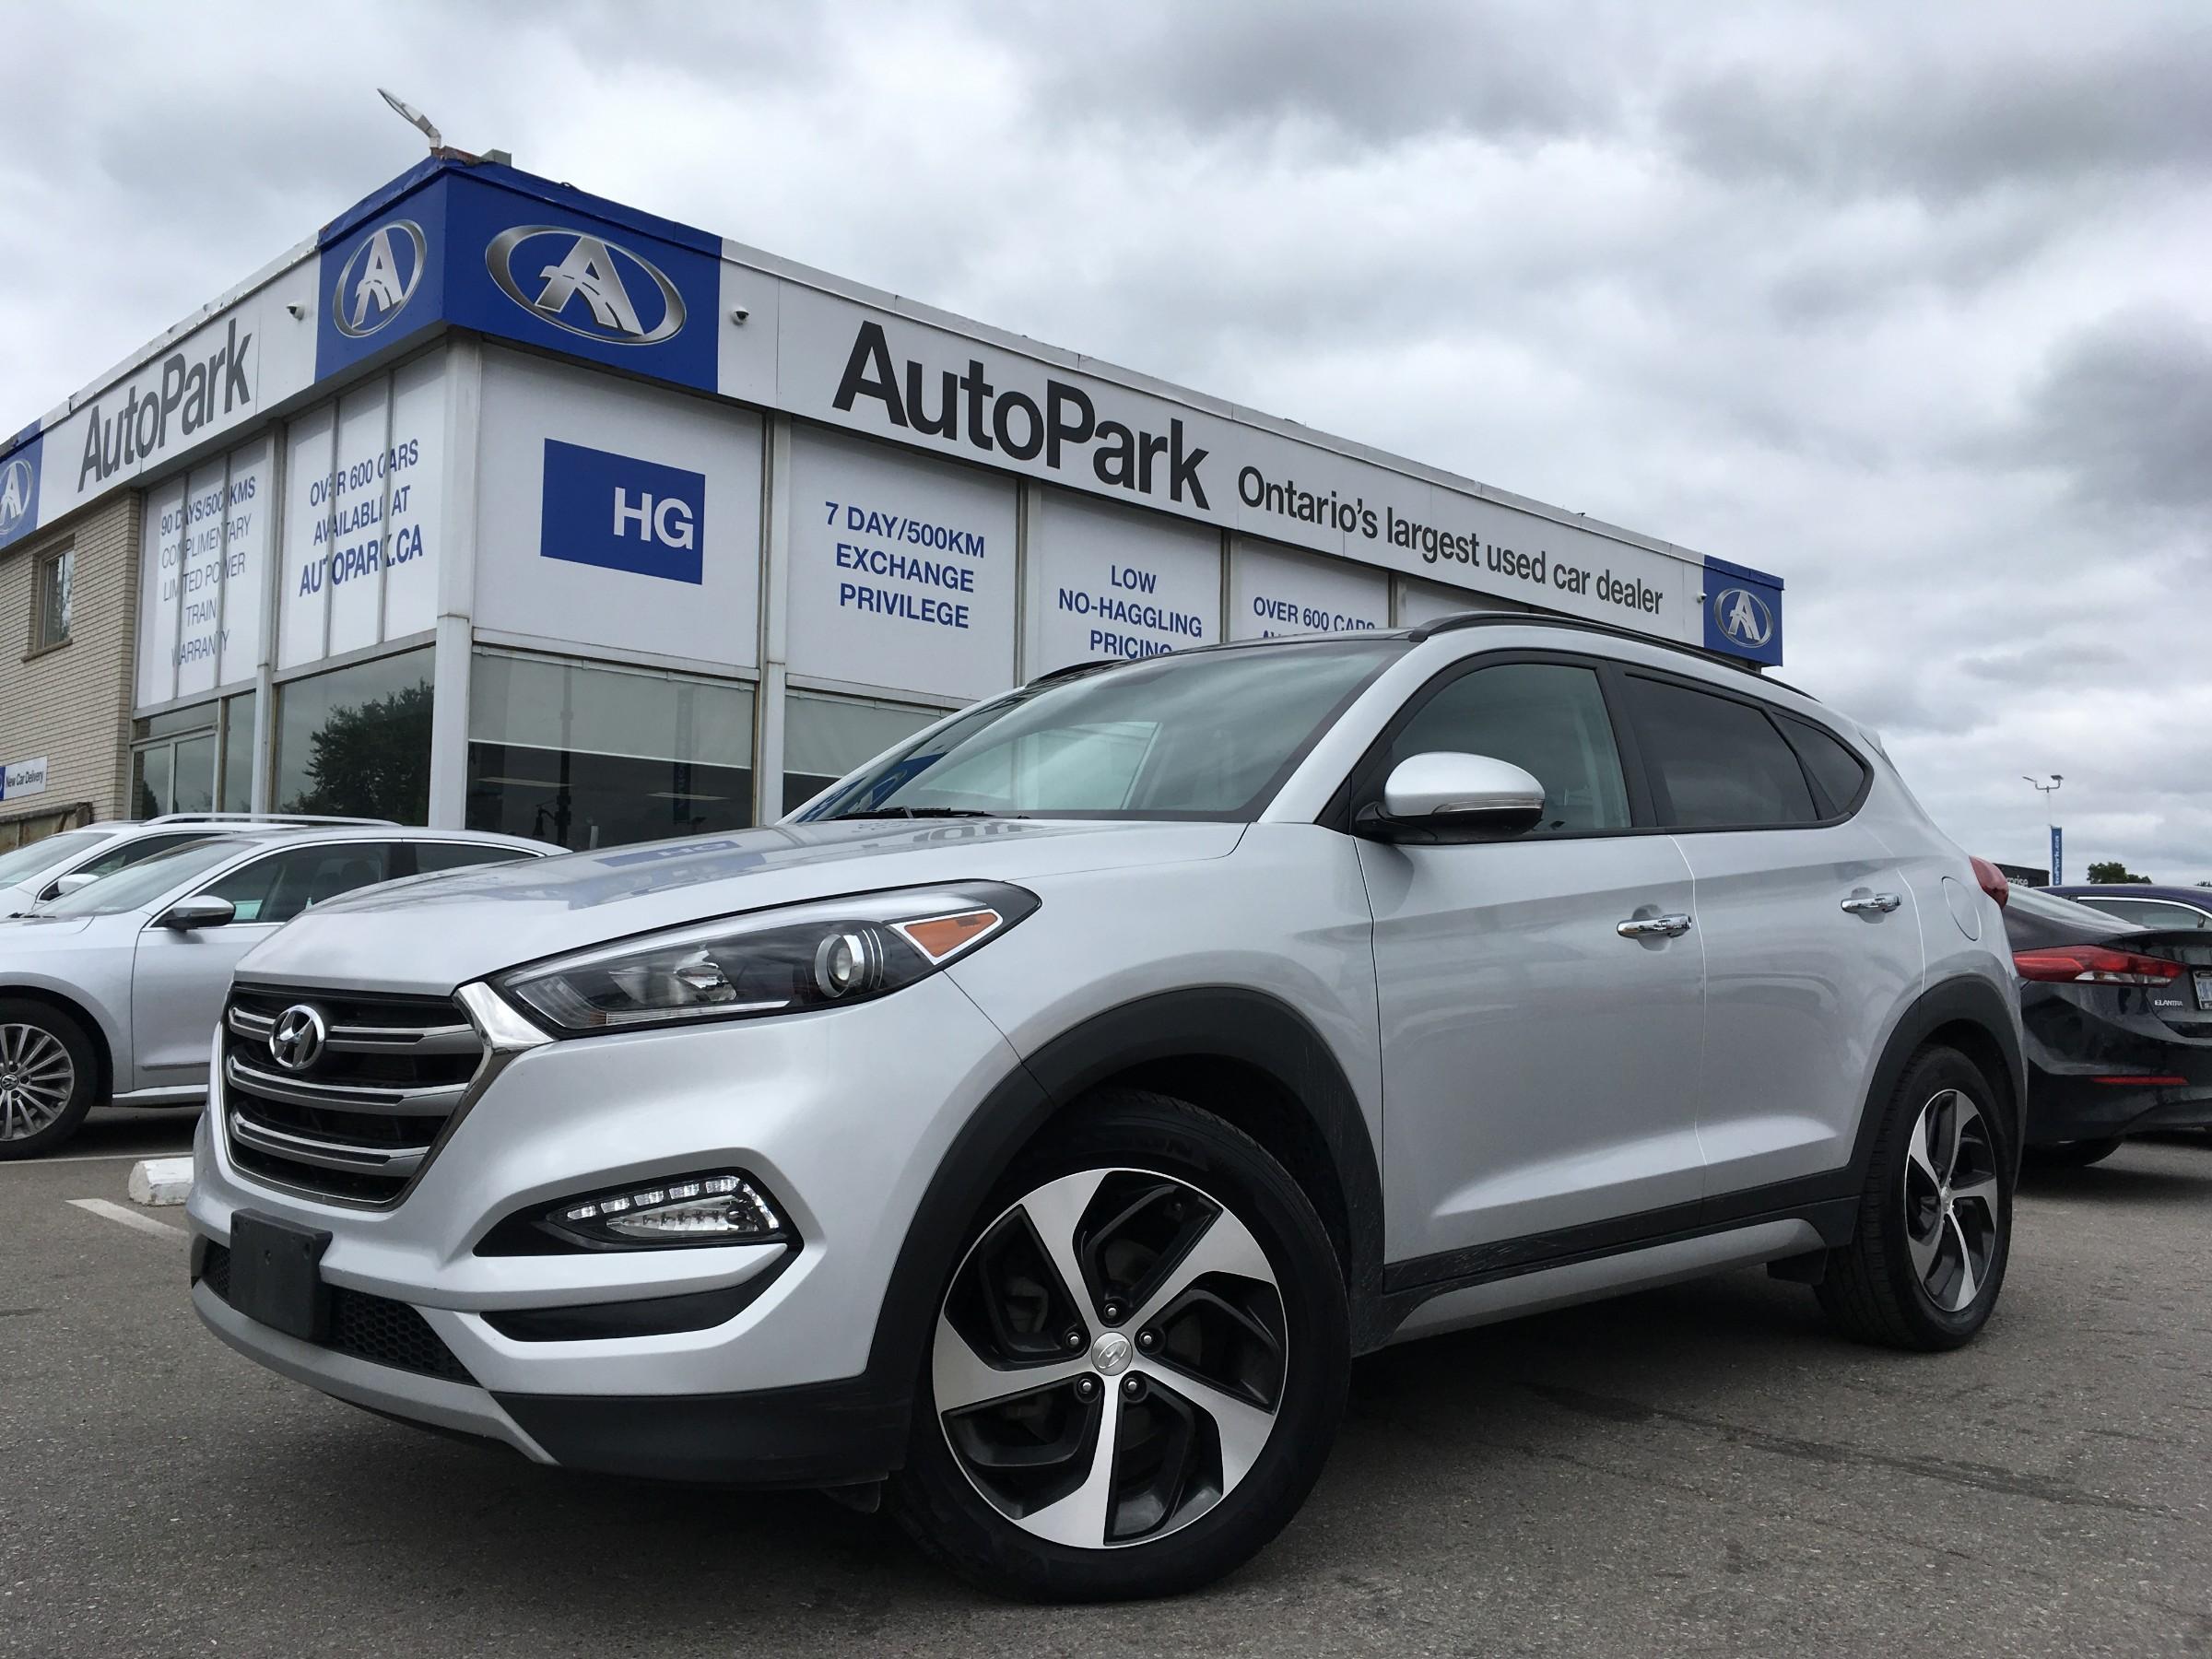 Used Hyundai Tucson For Sale Peterborough, ON - CarGurus